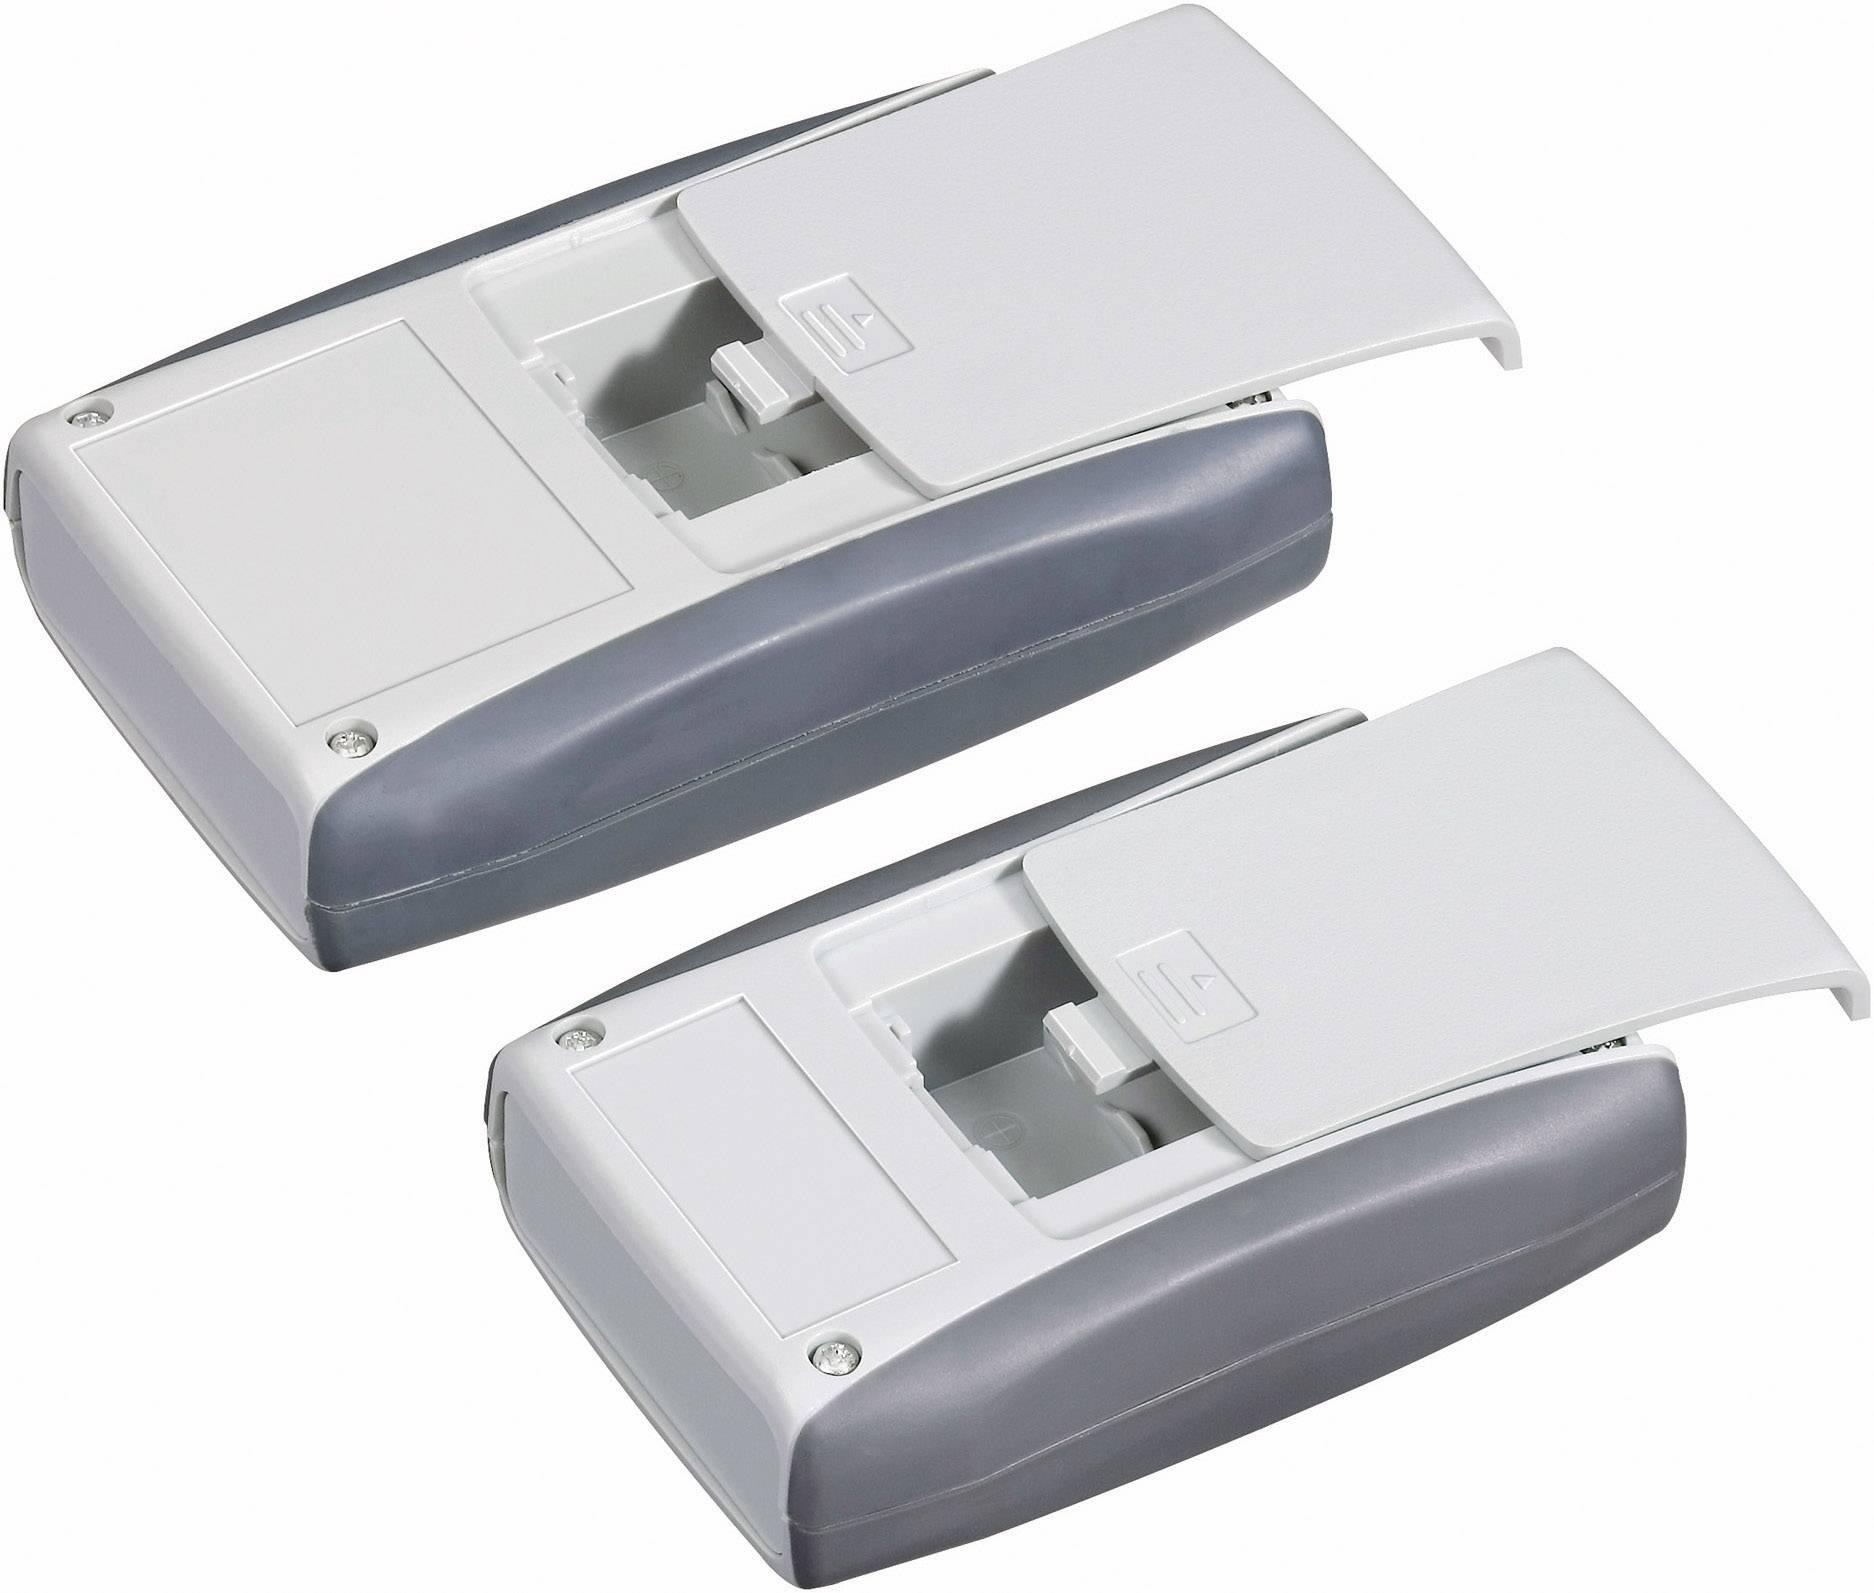 Plastová krabička Pactec PPL-2AA, 28 x 110 x 63 mm, ABS, svetlo sivá, 1 ks